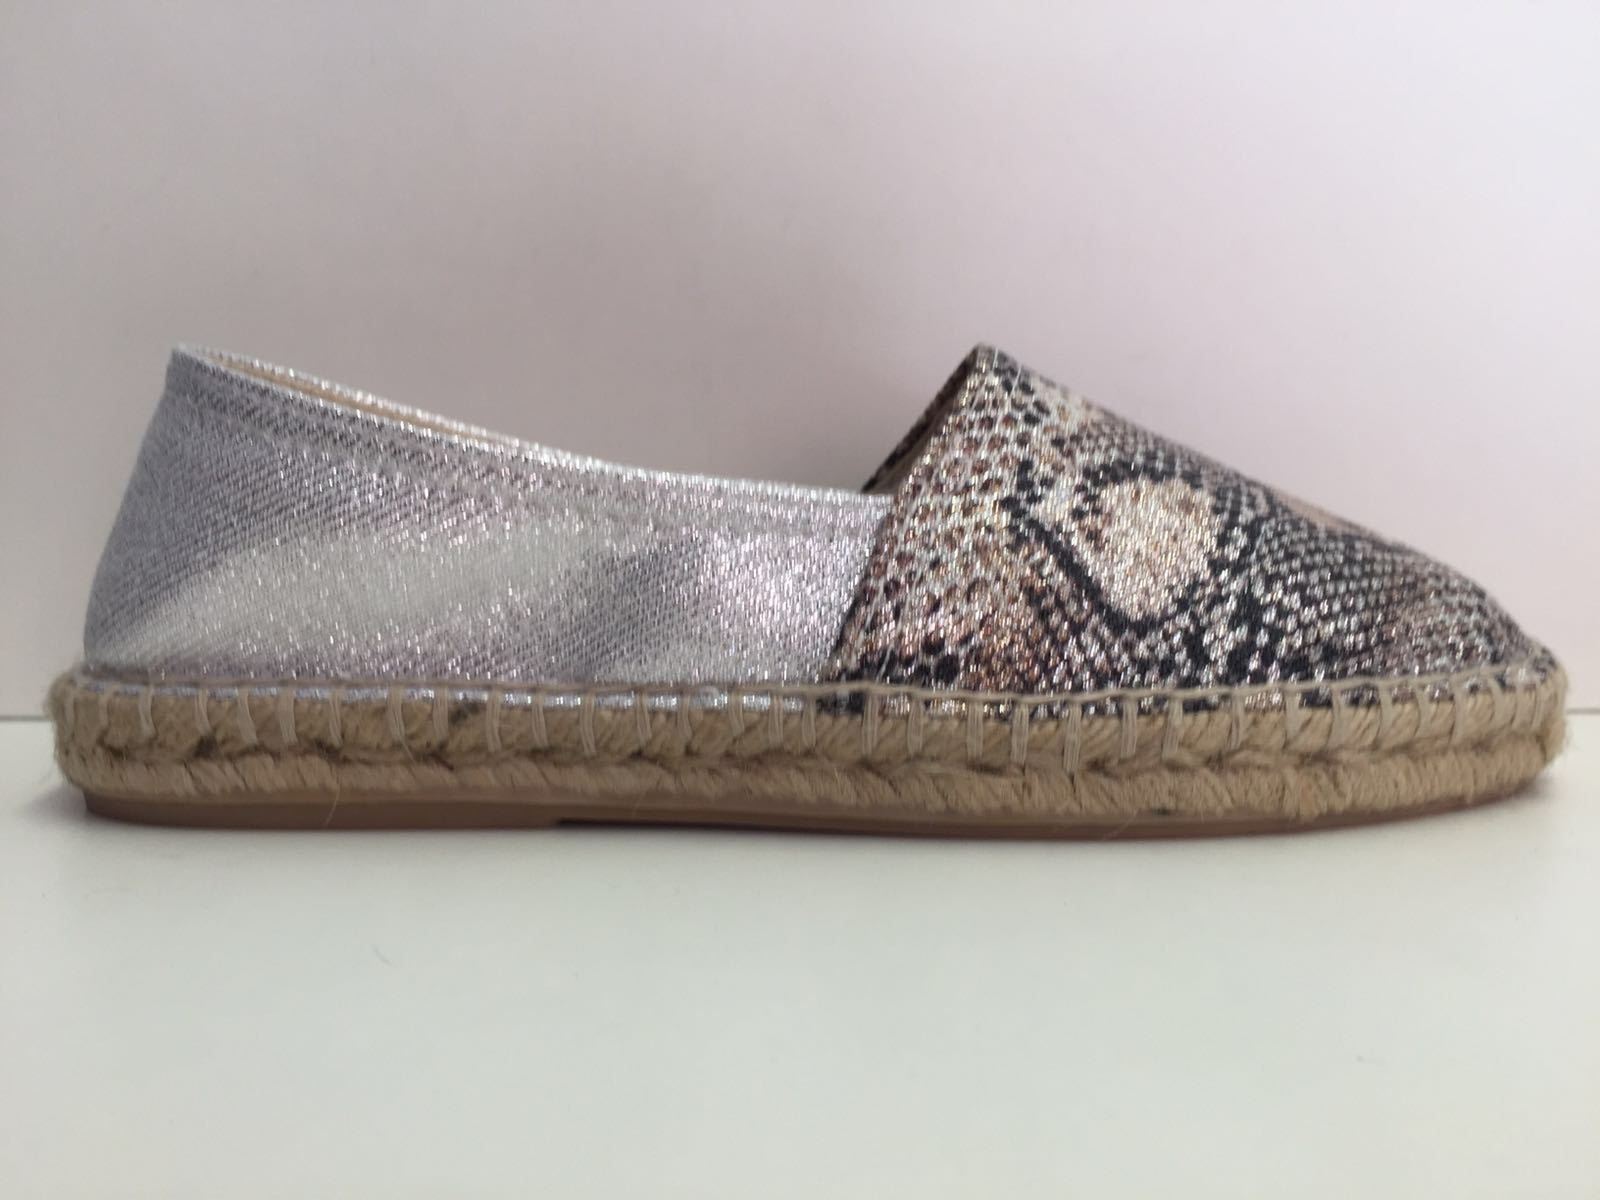 Sandali Originale Cordura Agora' Sandalo Donna Scarpe Espadrillas IYH2WD9E